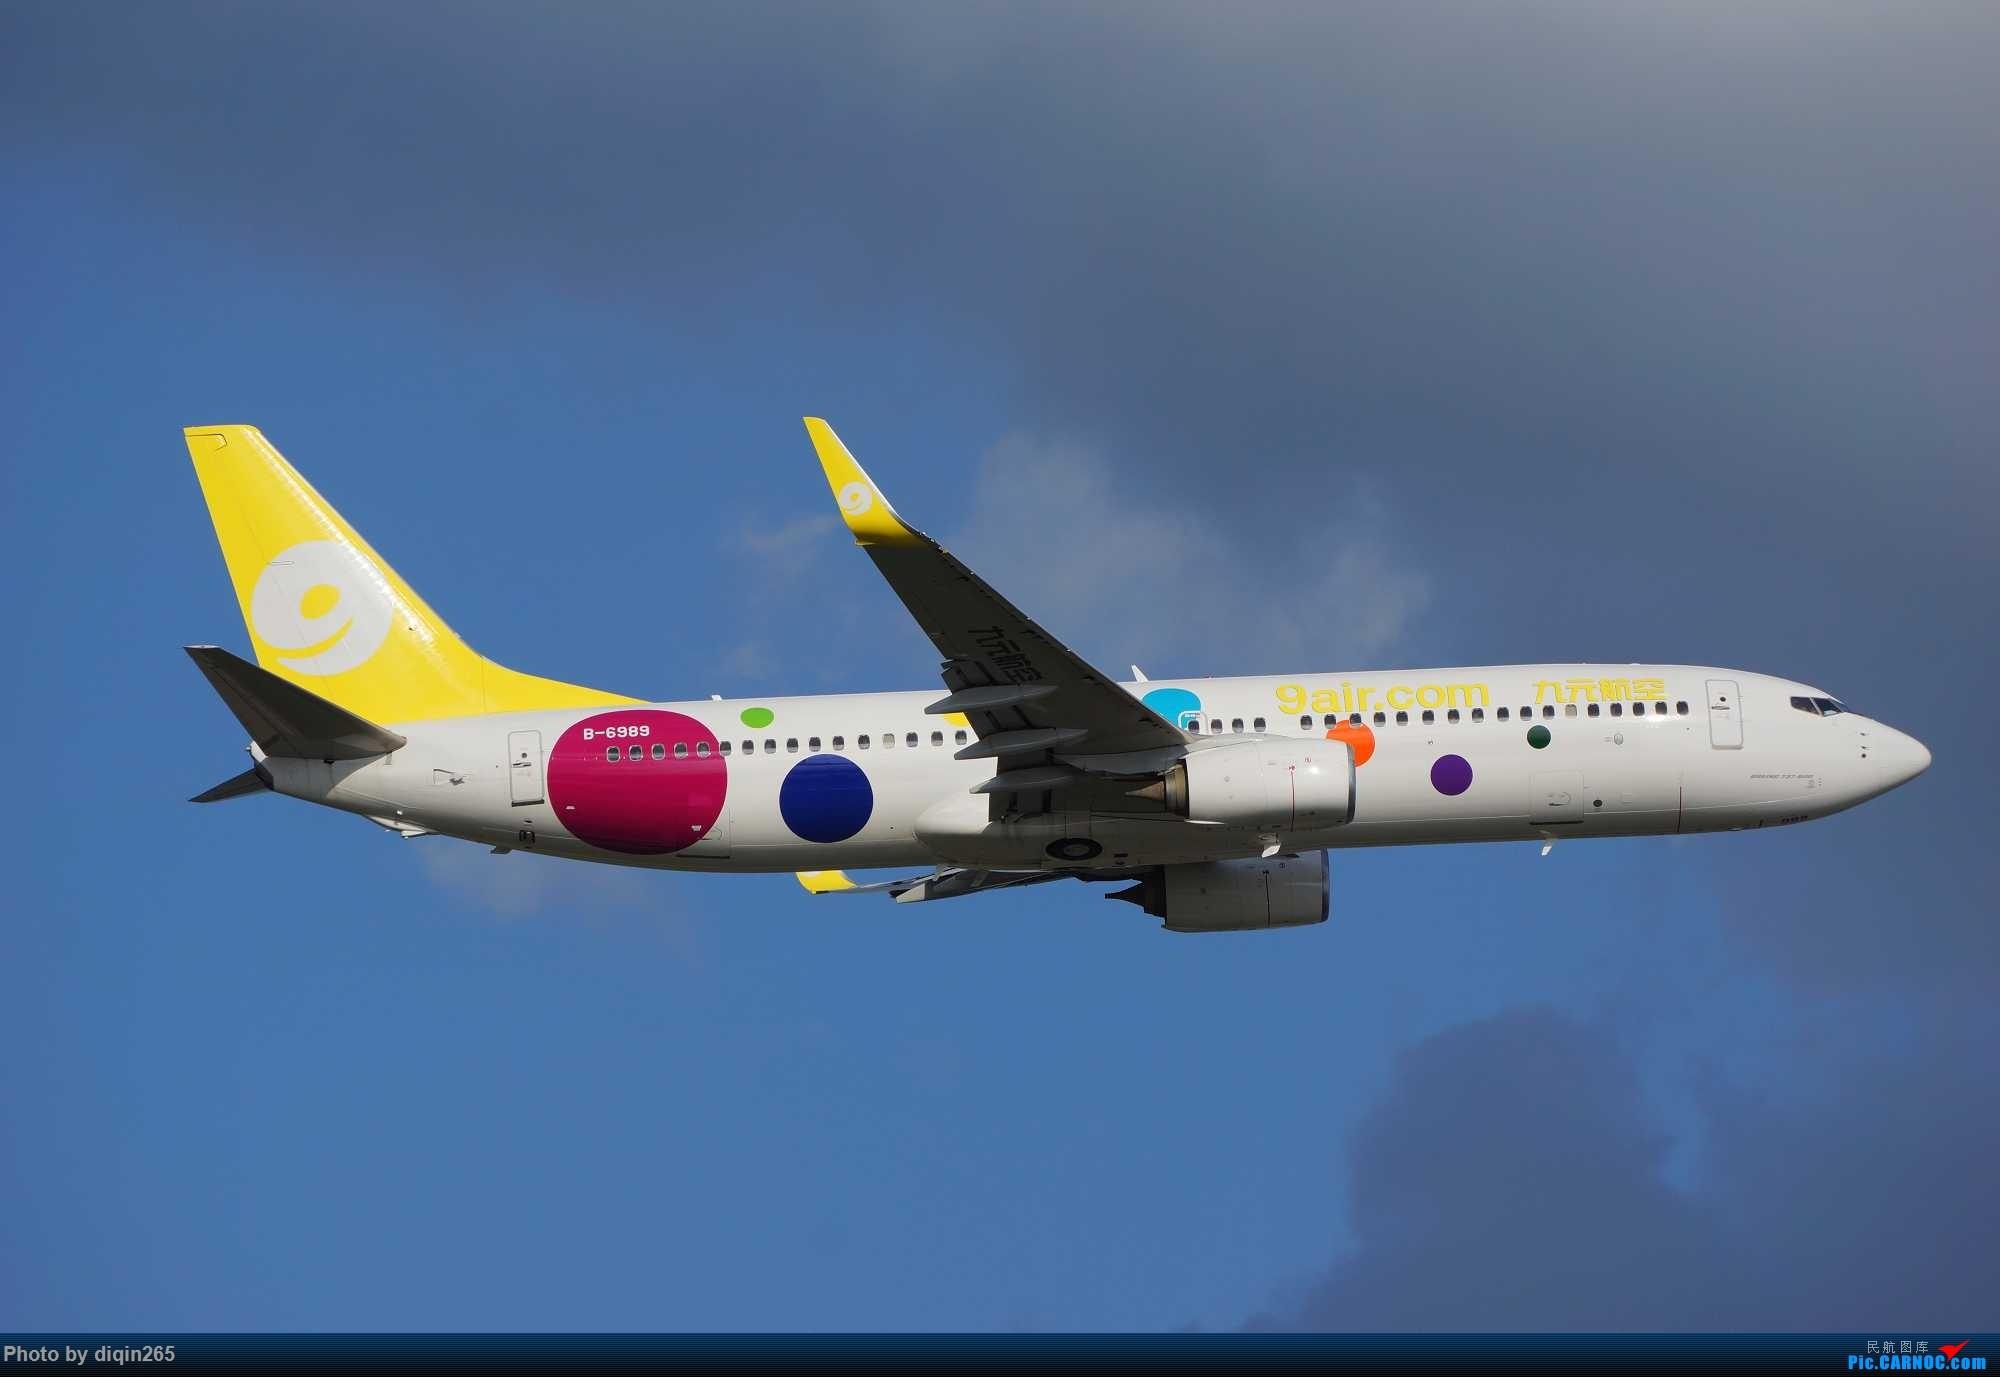 Re:[原创]CKG最近几天拍机现状:天气好 人受罪 心敞亮 BOEING 737-800 B-6989 中国重庆江北国际机场